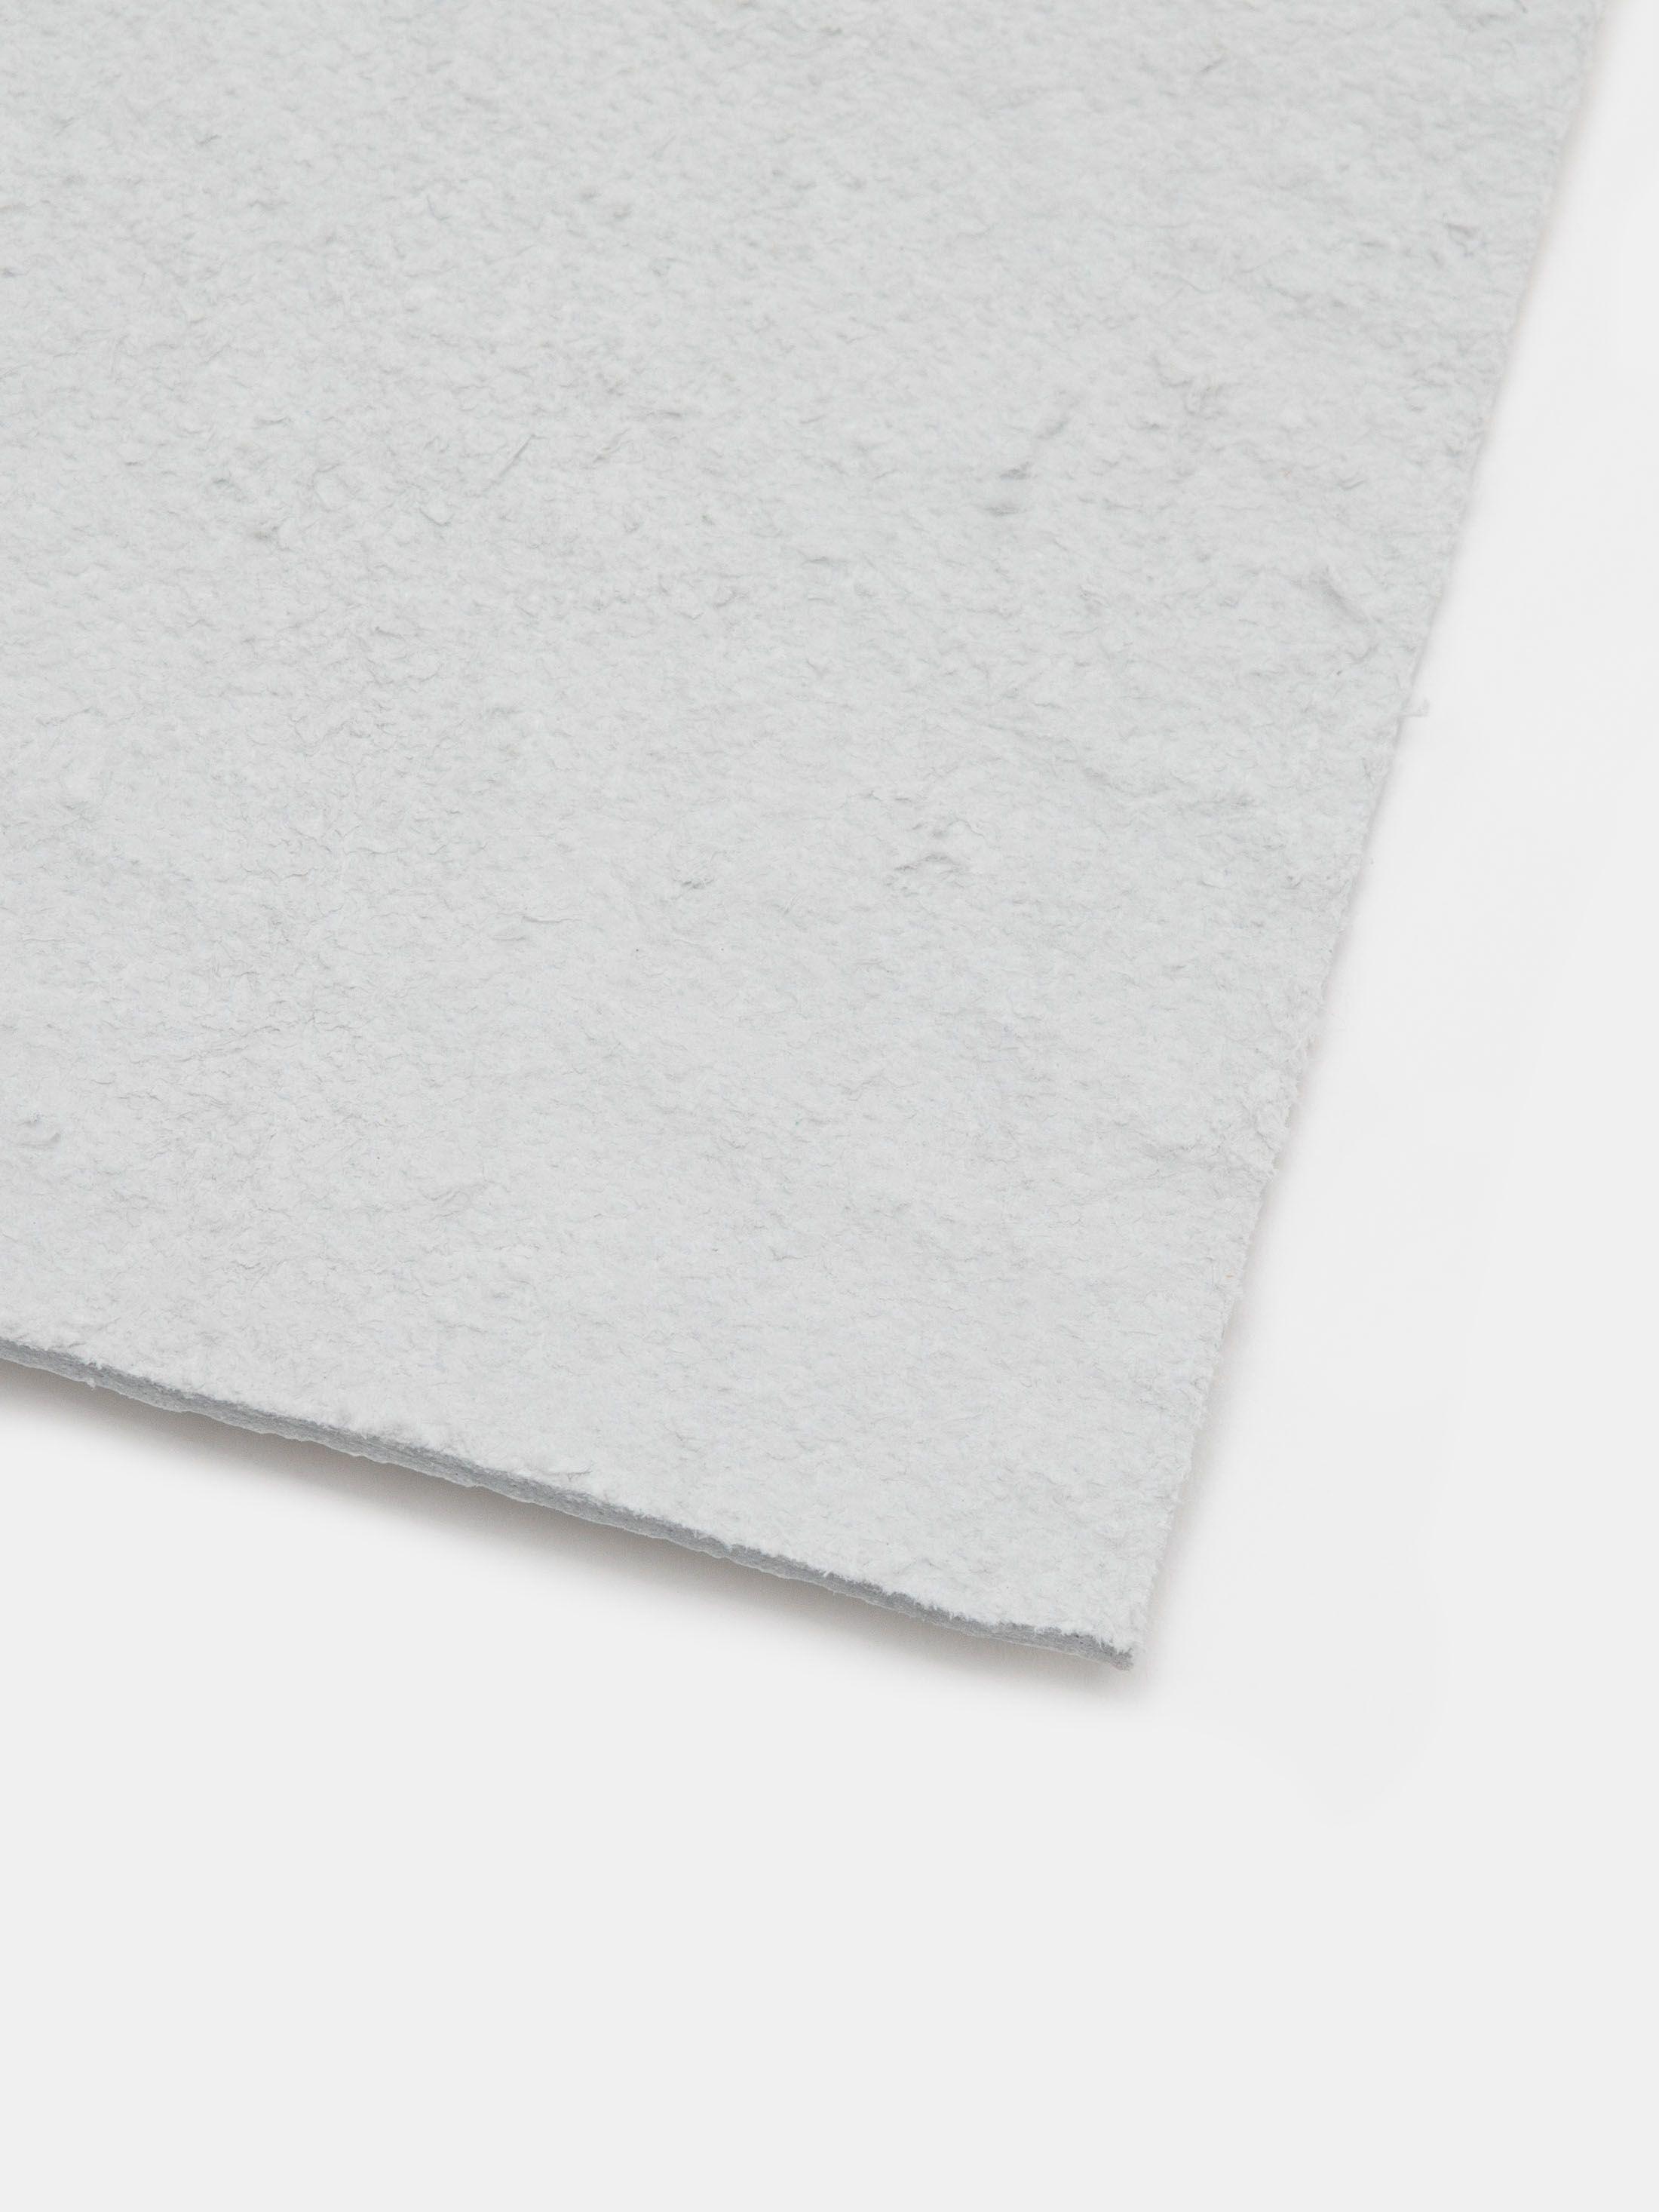 Designa egna hängetiketter i läder